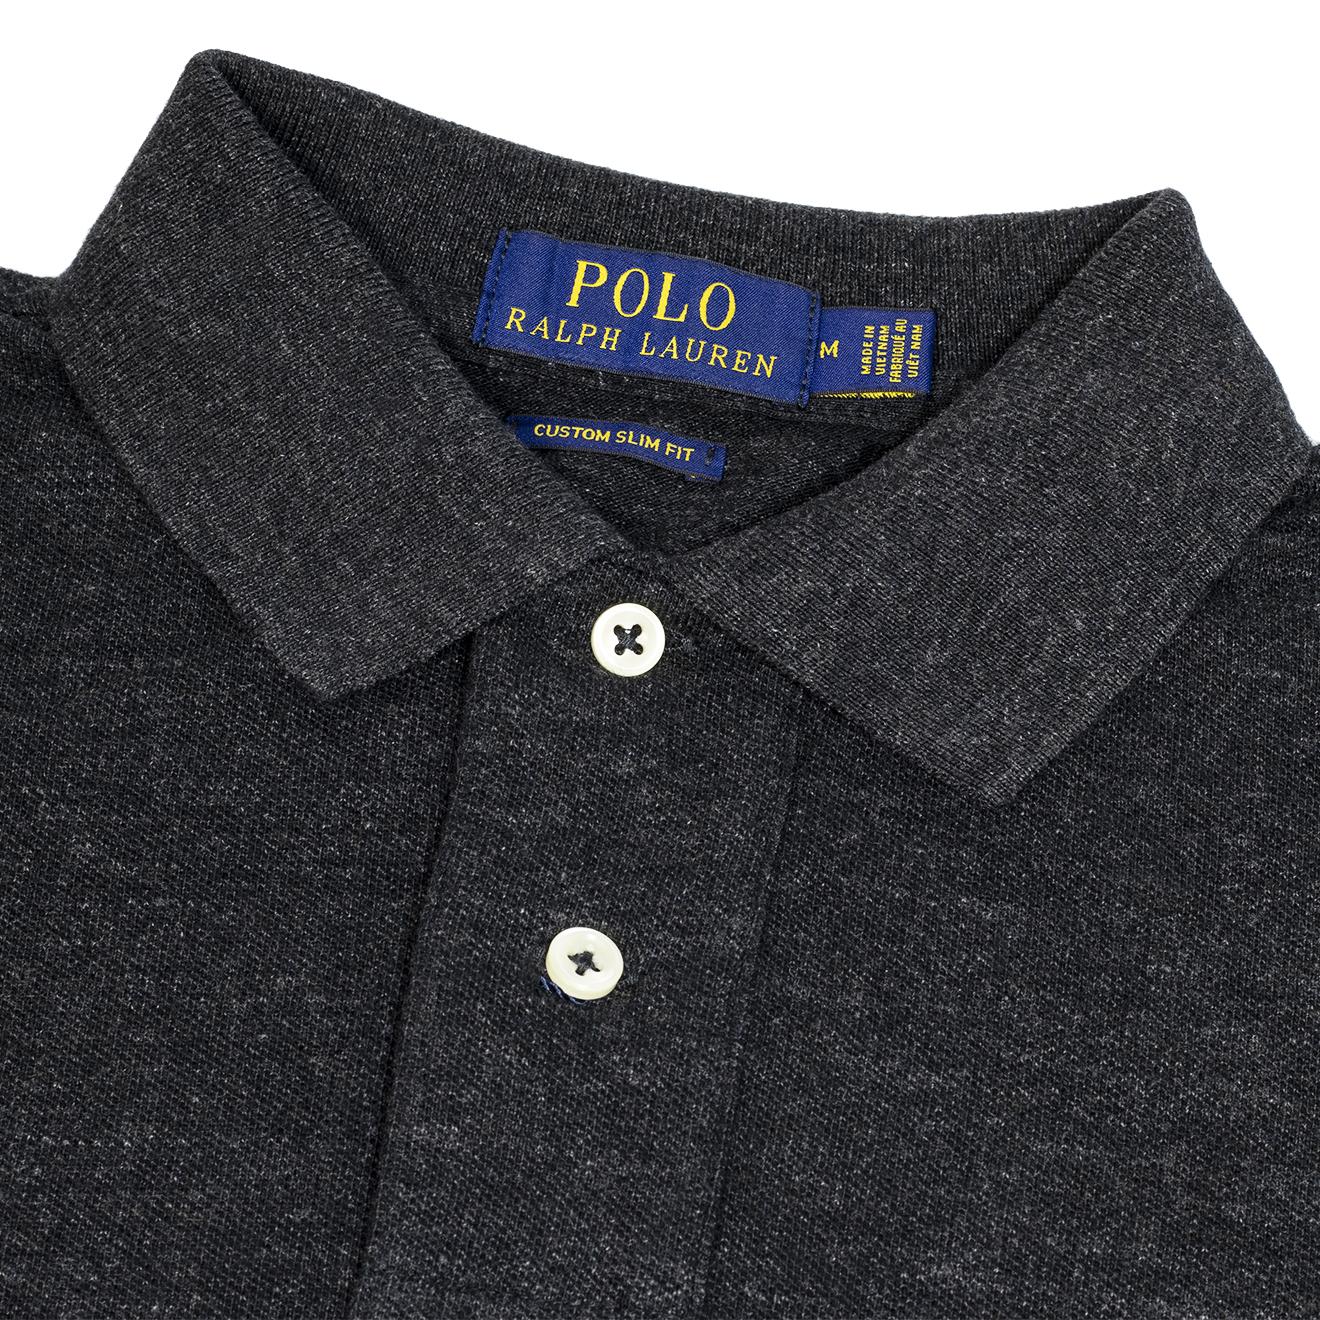 Polo Custom Marl Lodge Sporting Mesh Lauren Heather Fit Ls Ralph The Slim Black kOTZiwPXul